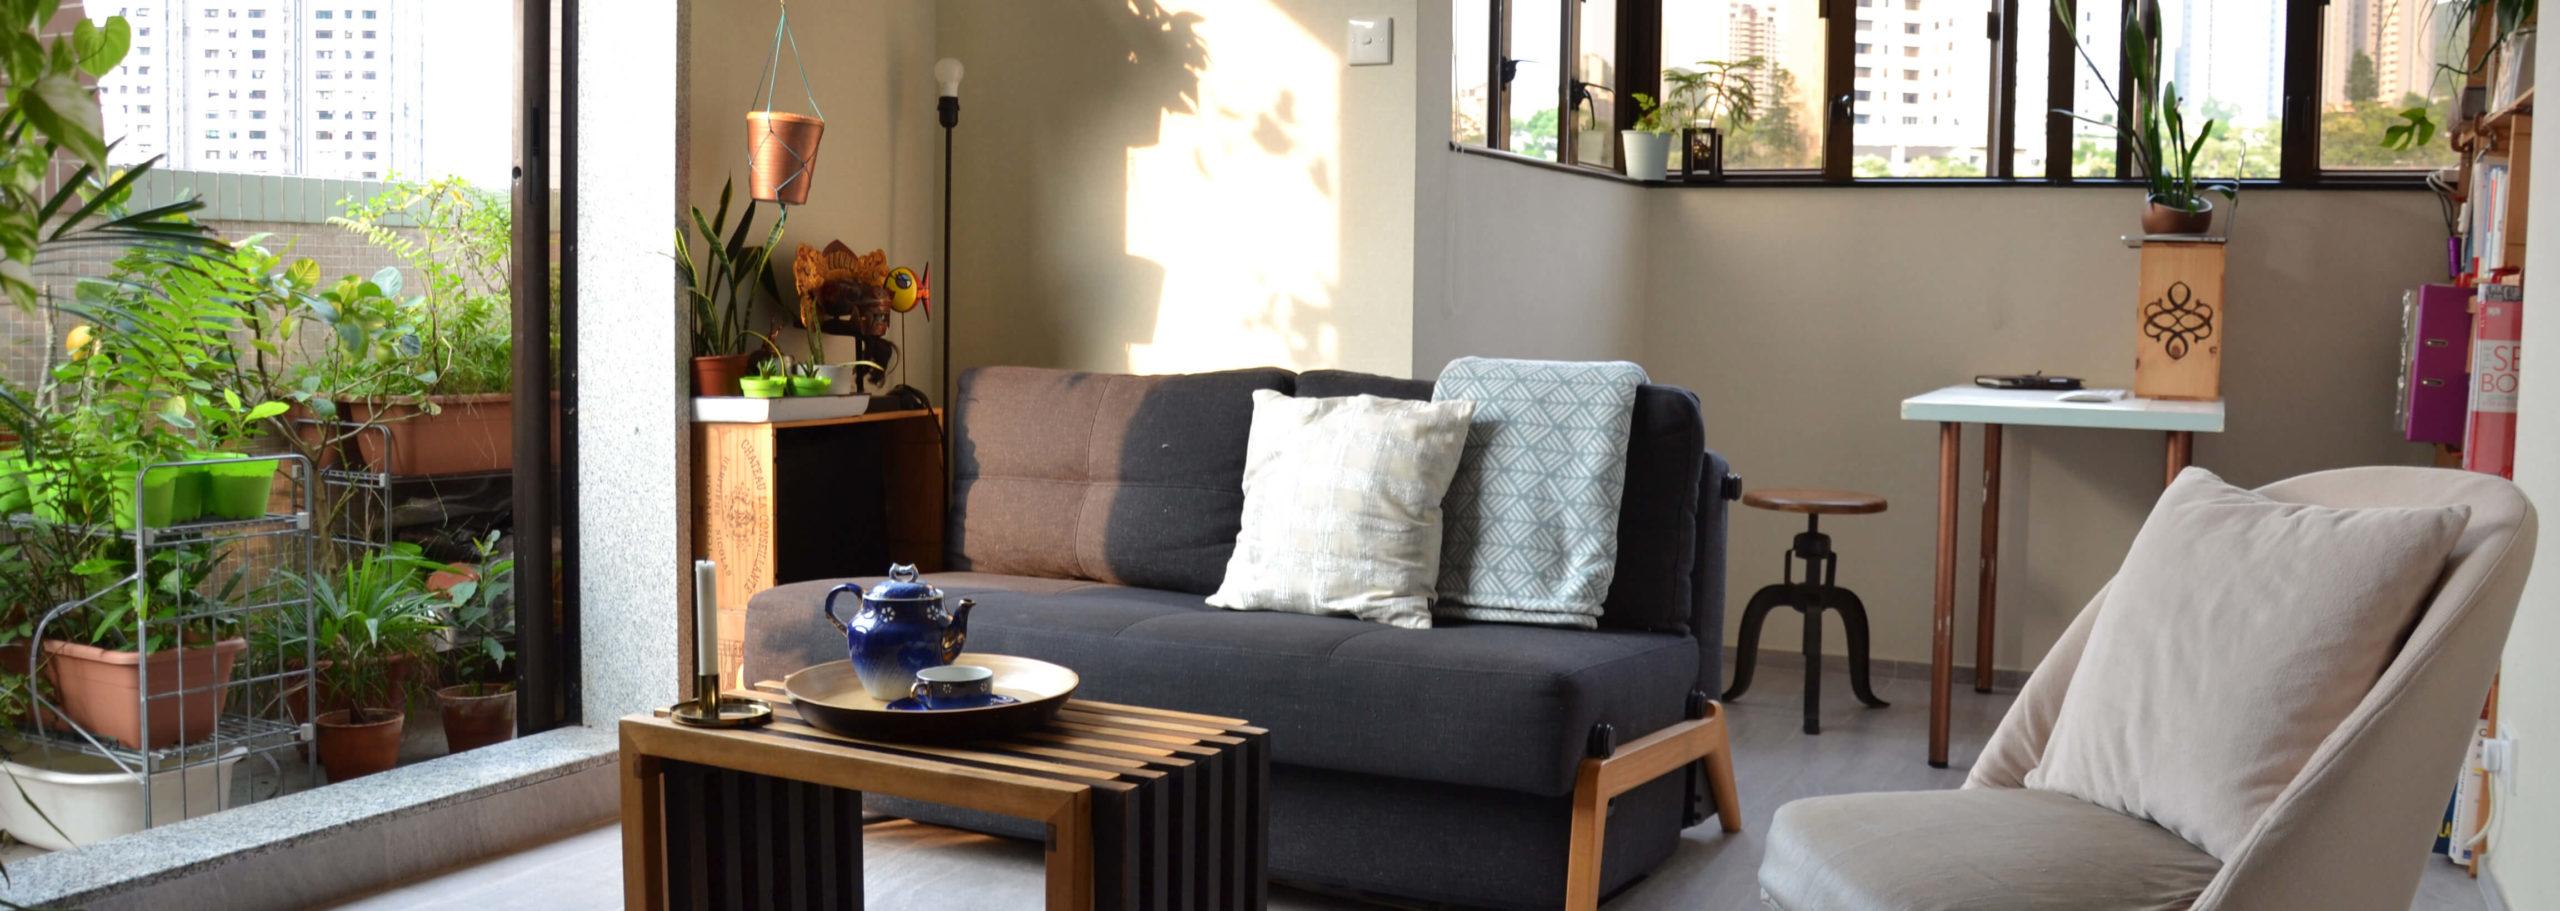 Home Lighting – Part 1 of 3